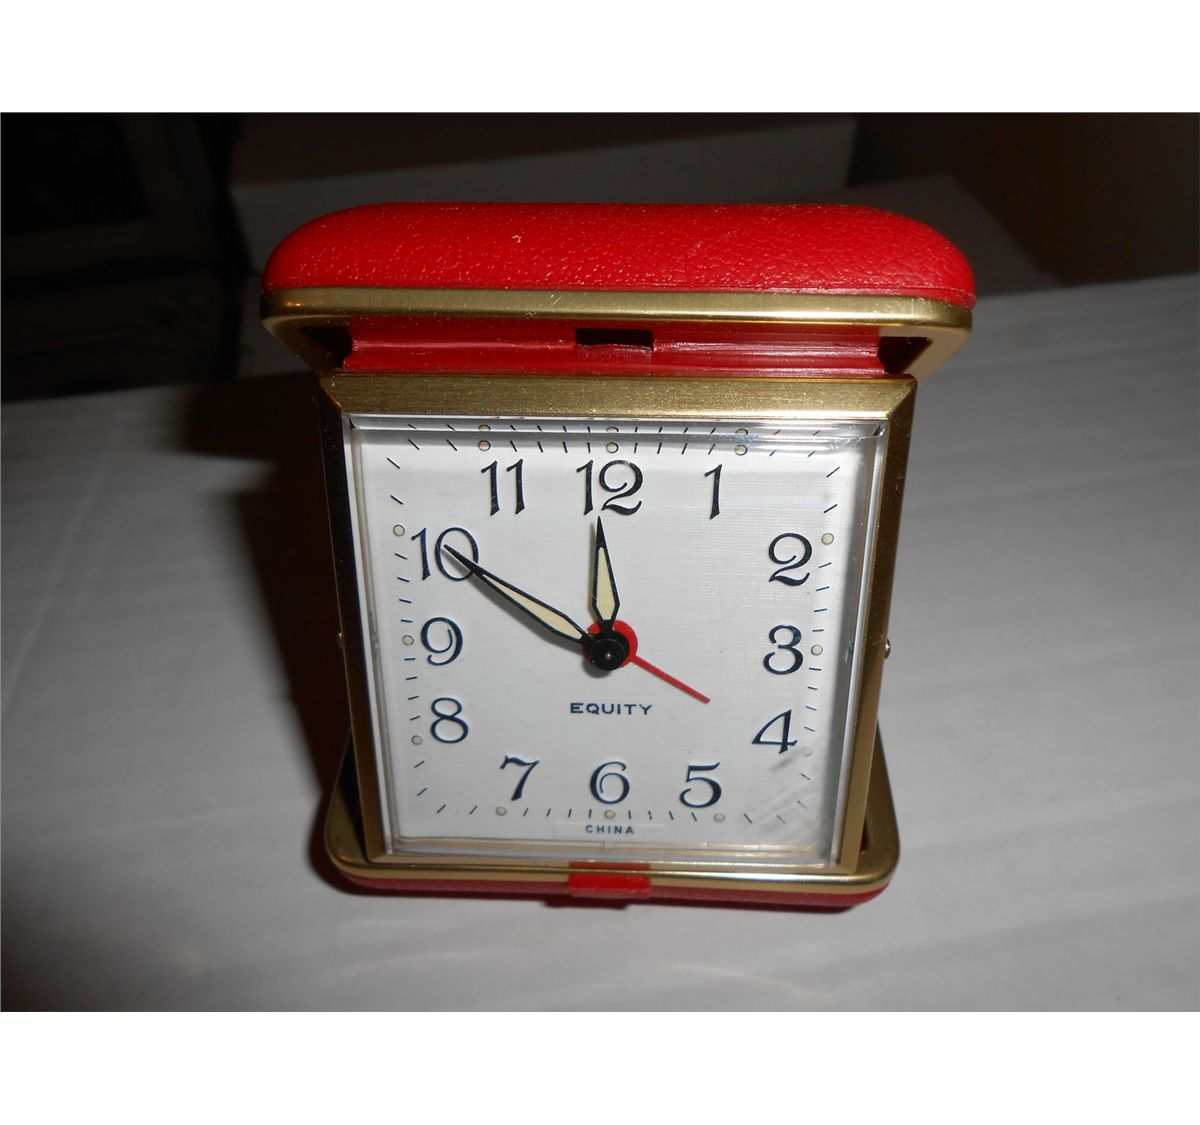 Vintage Equity Wind Up Travel Alarm Clock